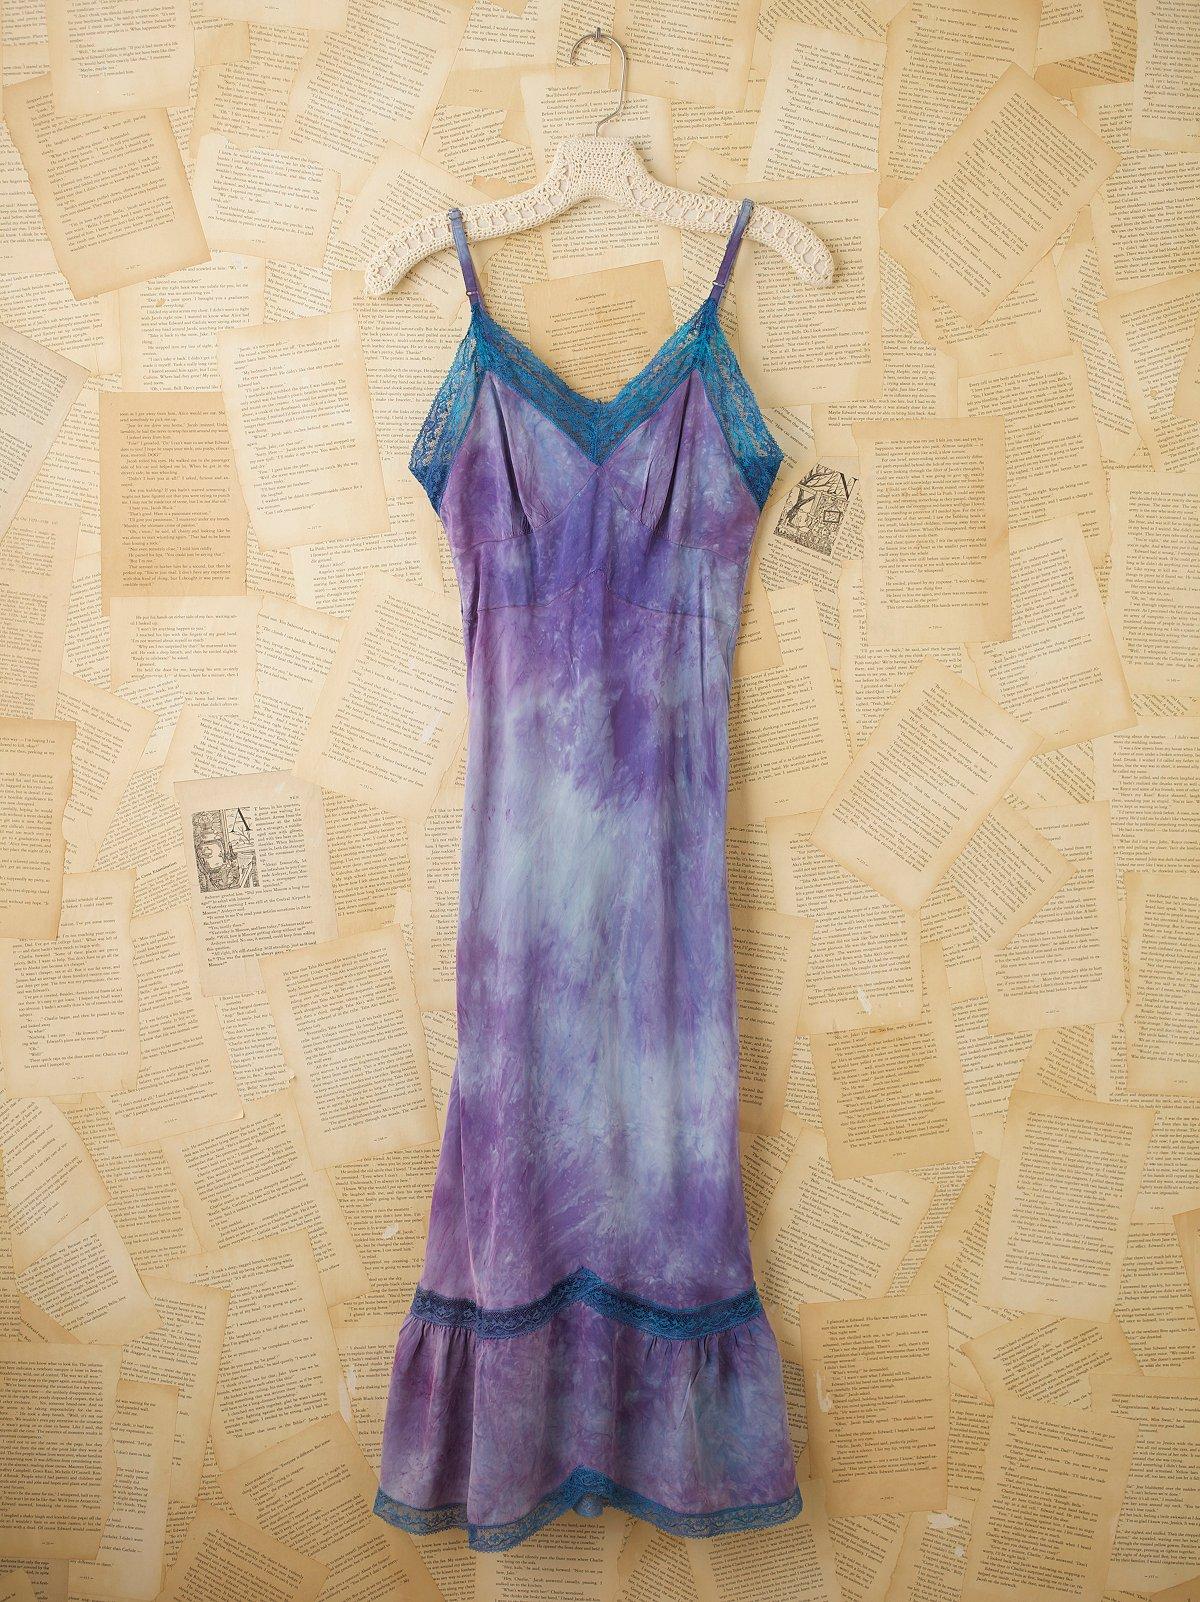 Vintage 40s Hand Dyed Rayon Slip Dress